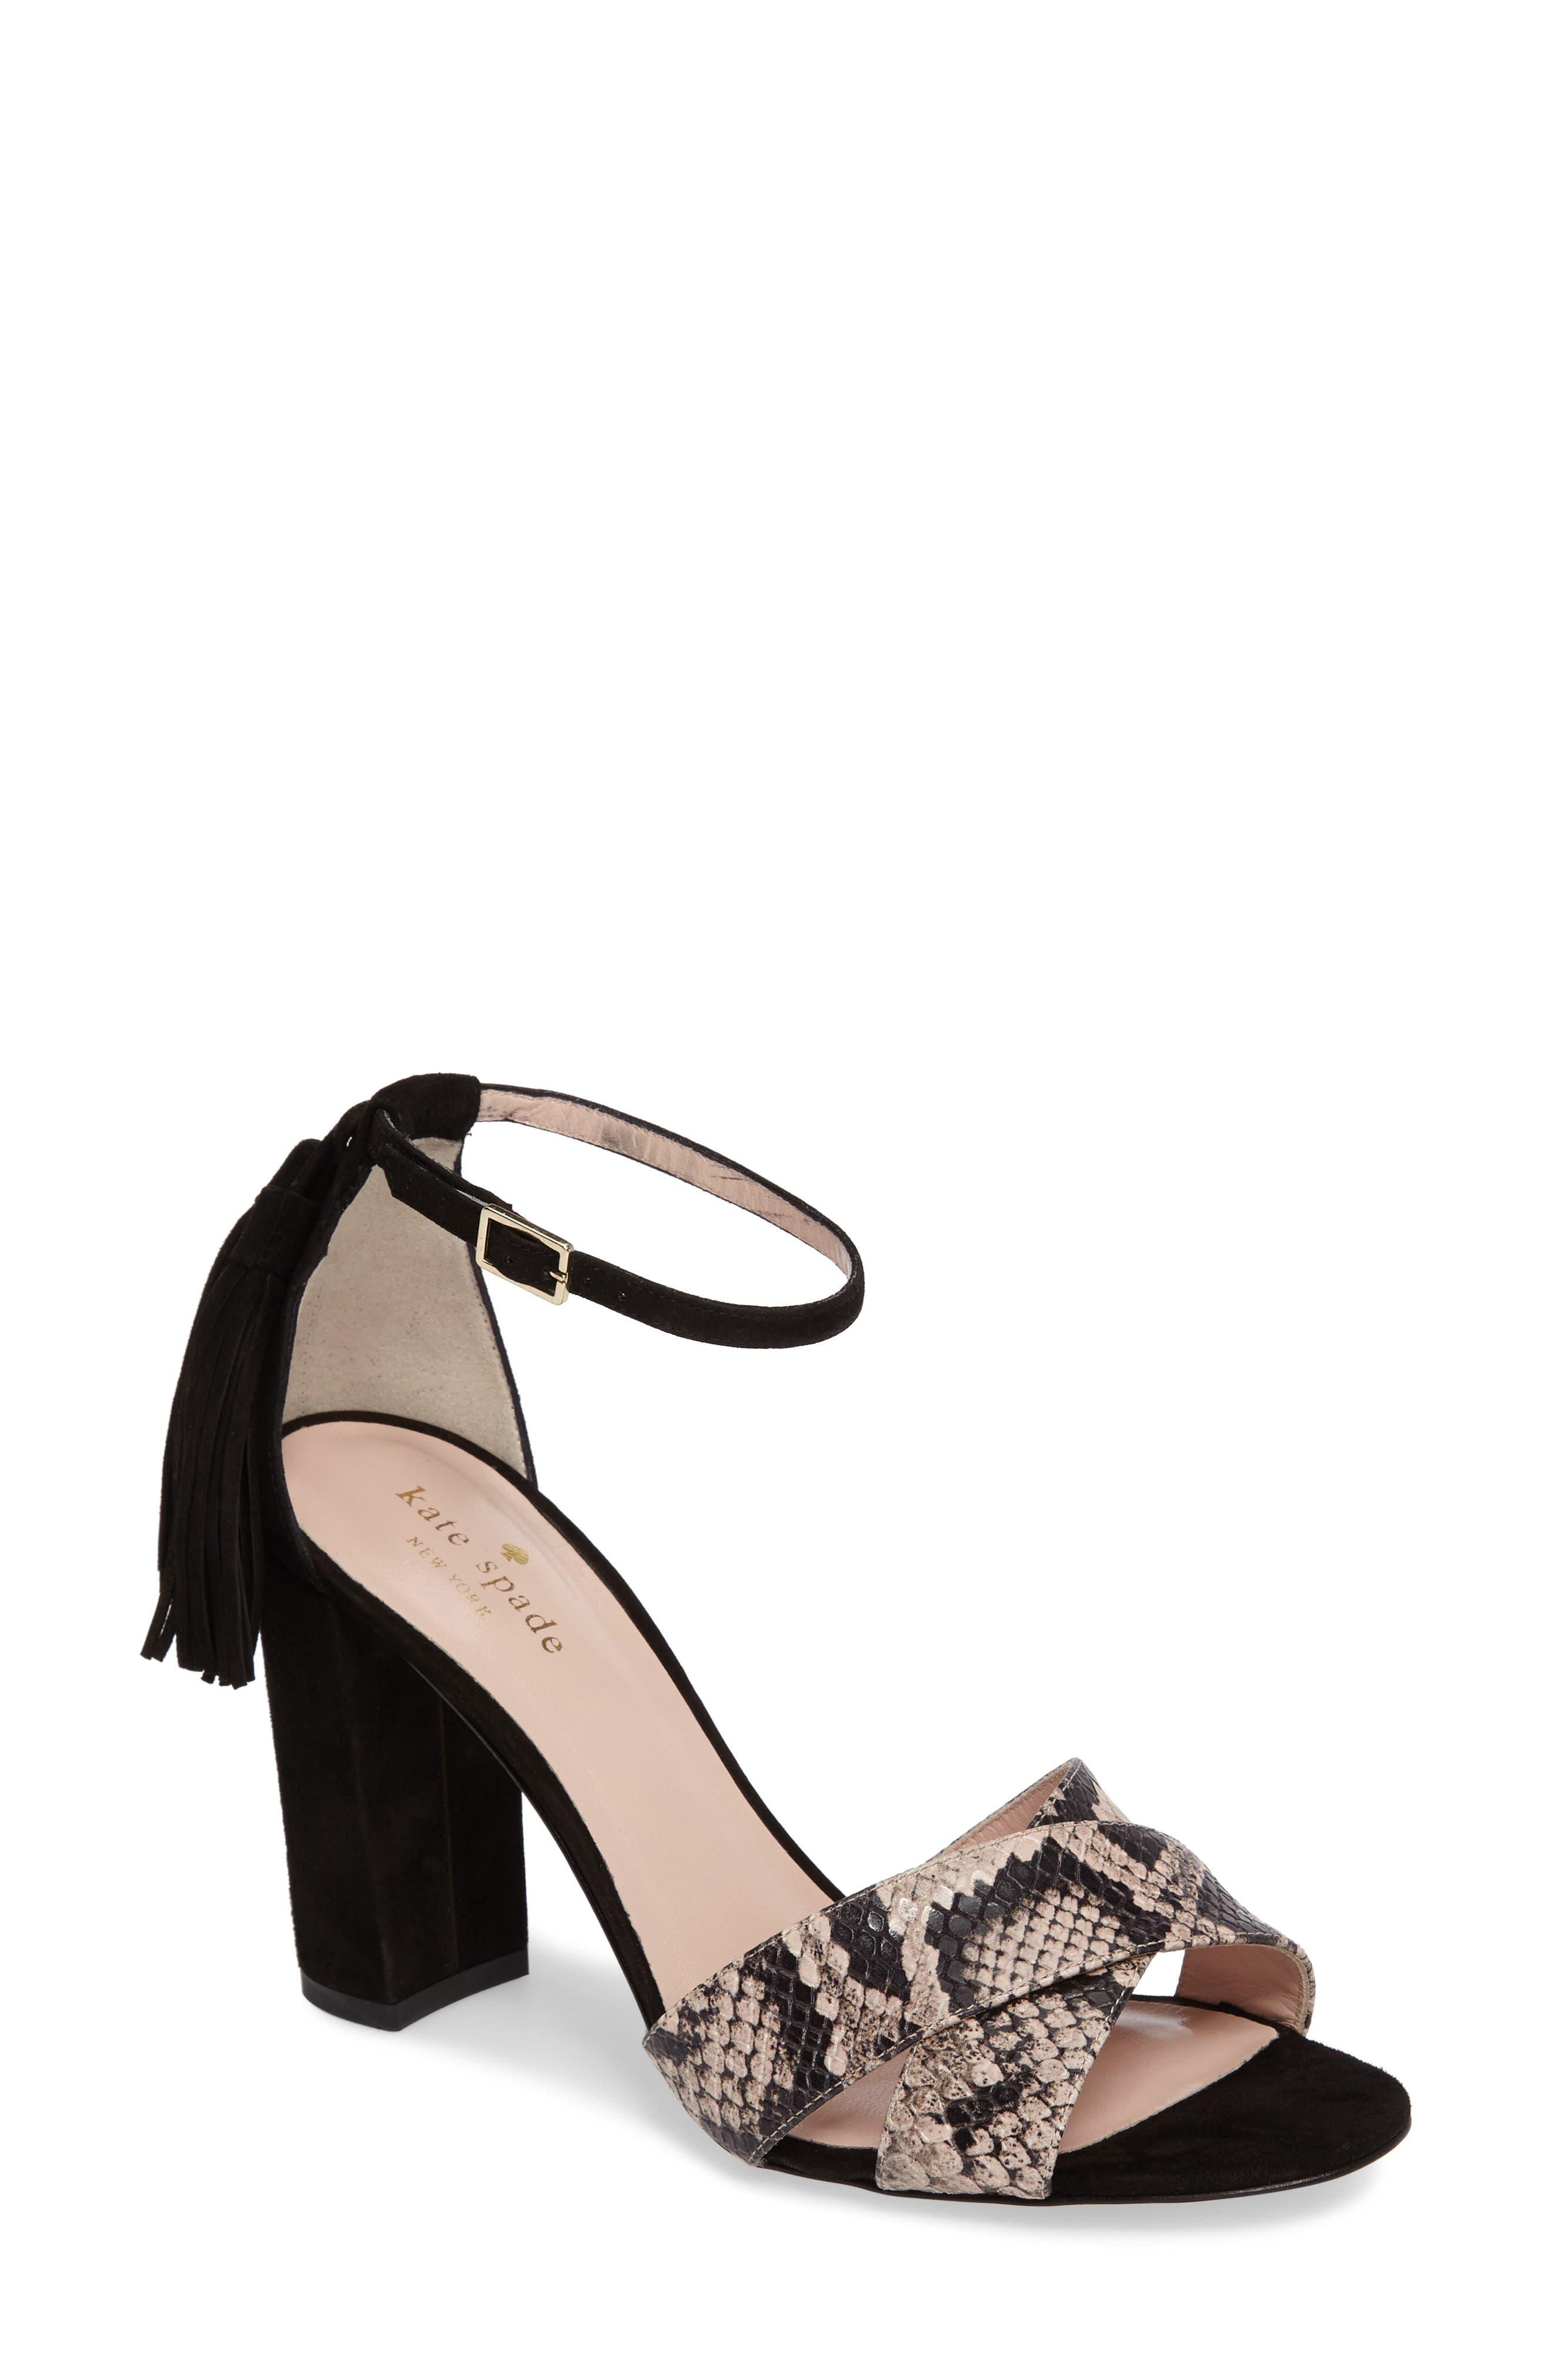 kate spade new york idanna sandal (Women)